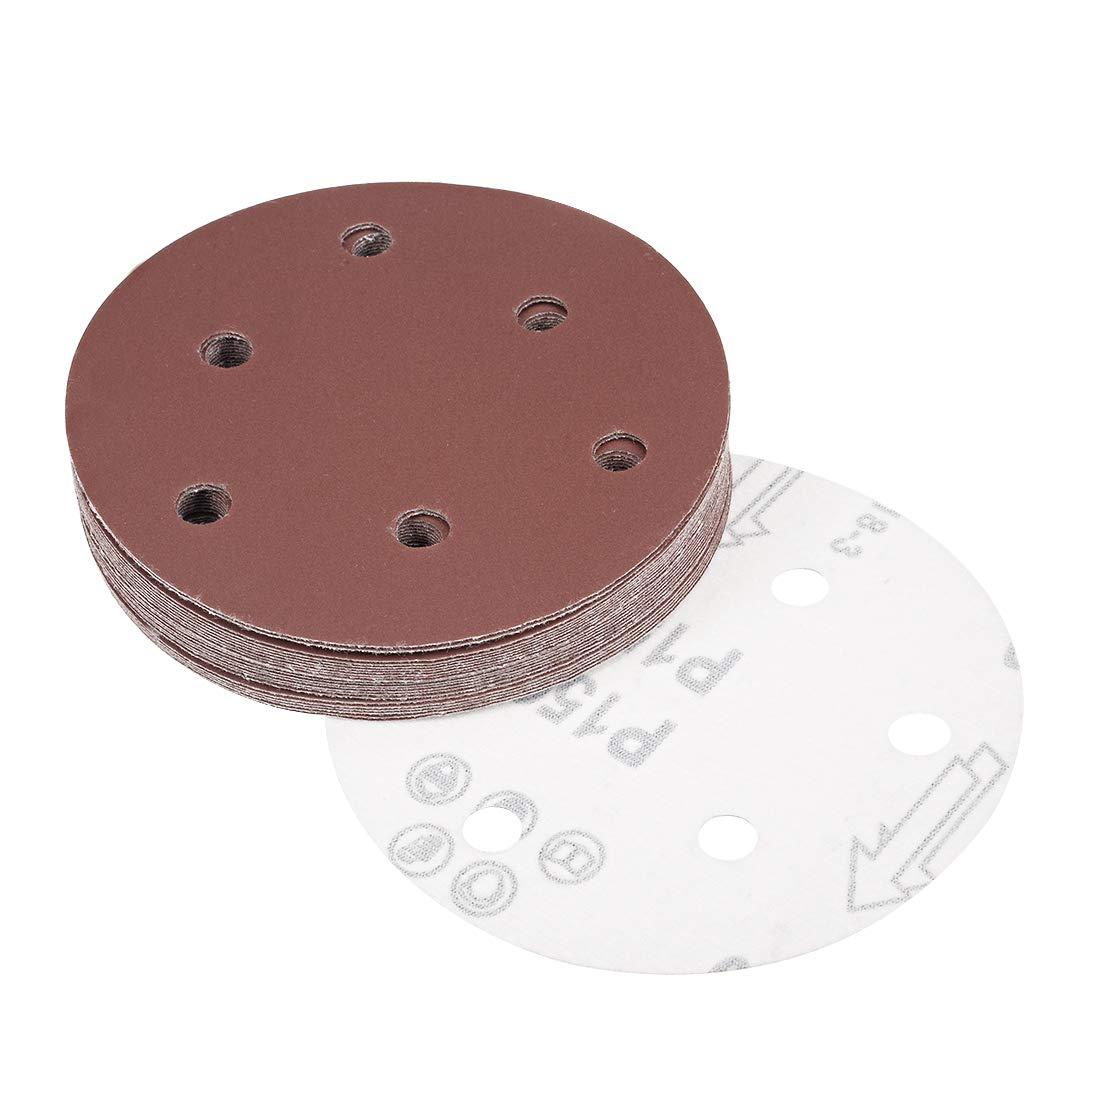 uxcell 5-Inch Sanding Disc 6 Holes 40 Grits Aluminum Oxide Flocking Back Sandpapers for Sanders 25 Pcs